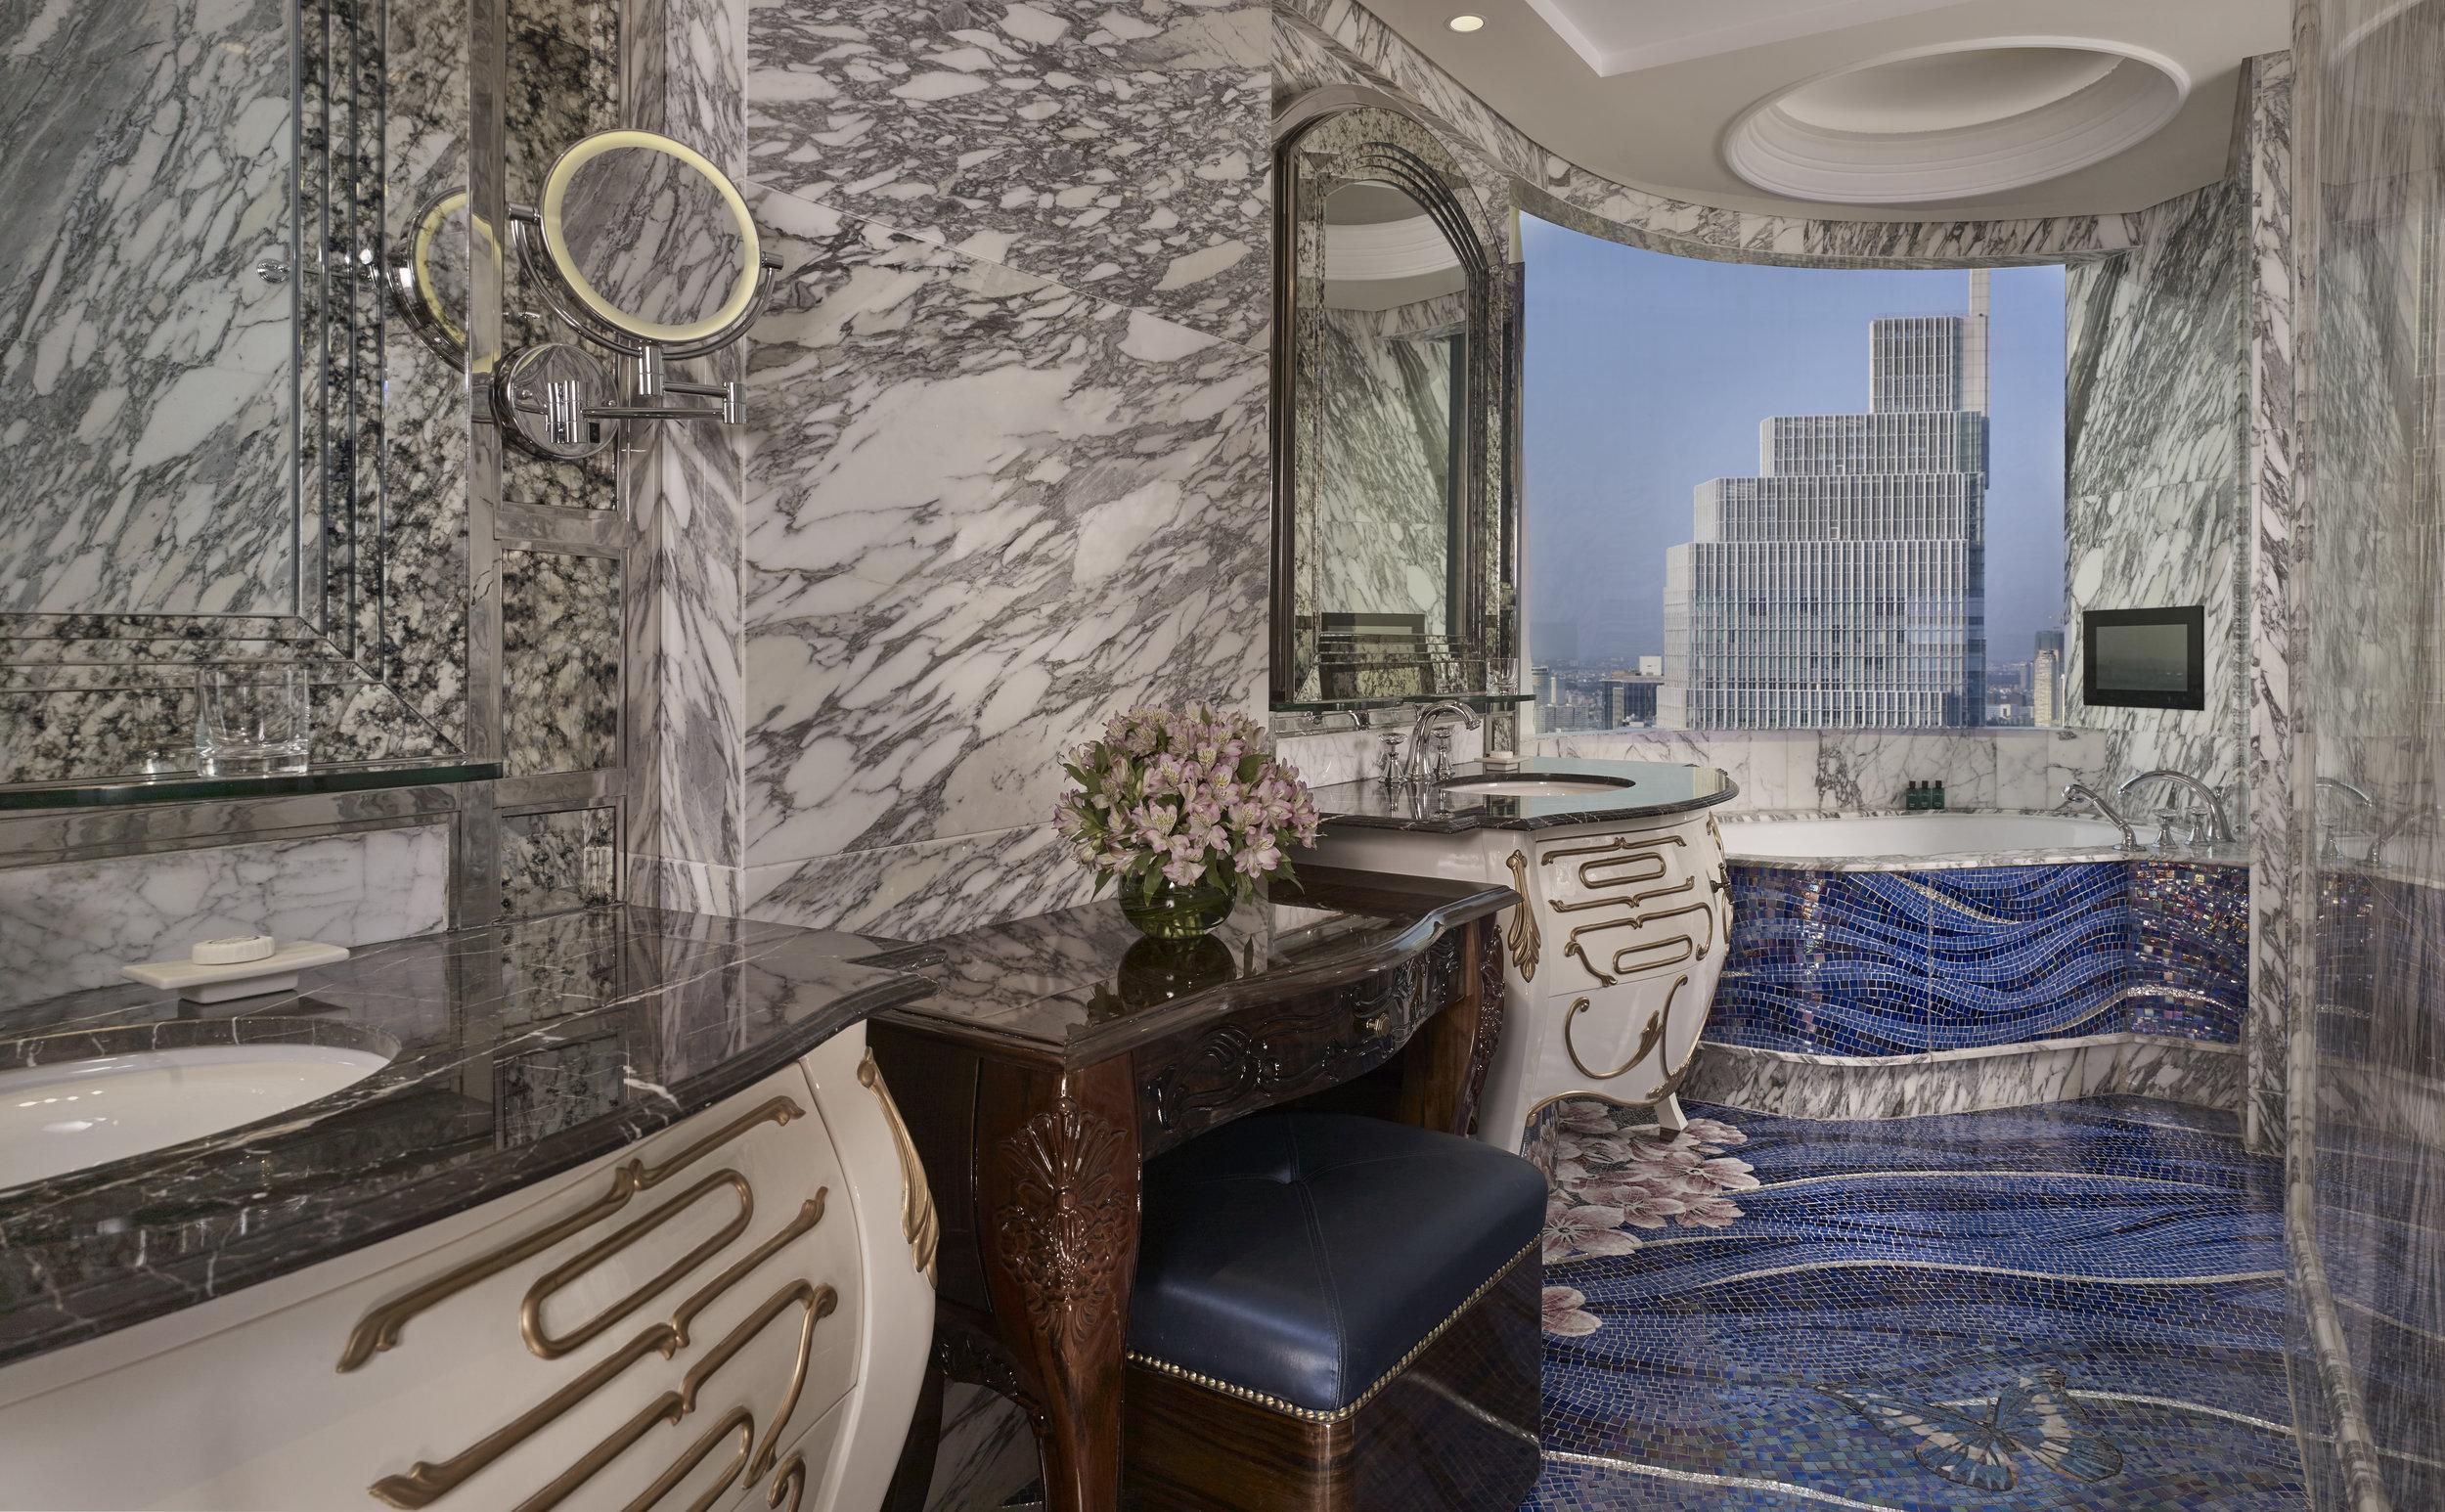 The Reverie Saigon - Panorama Suite by Giorgetti - Bathroom.jpg